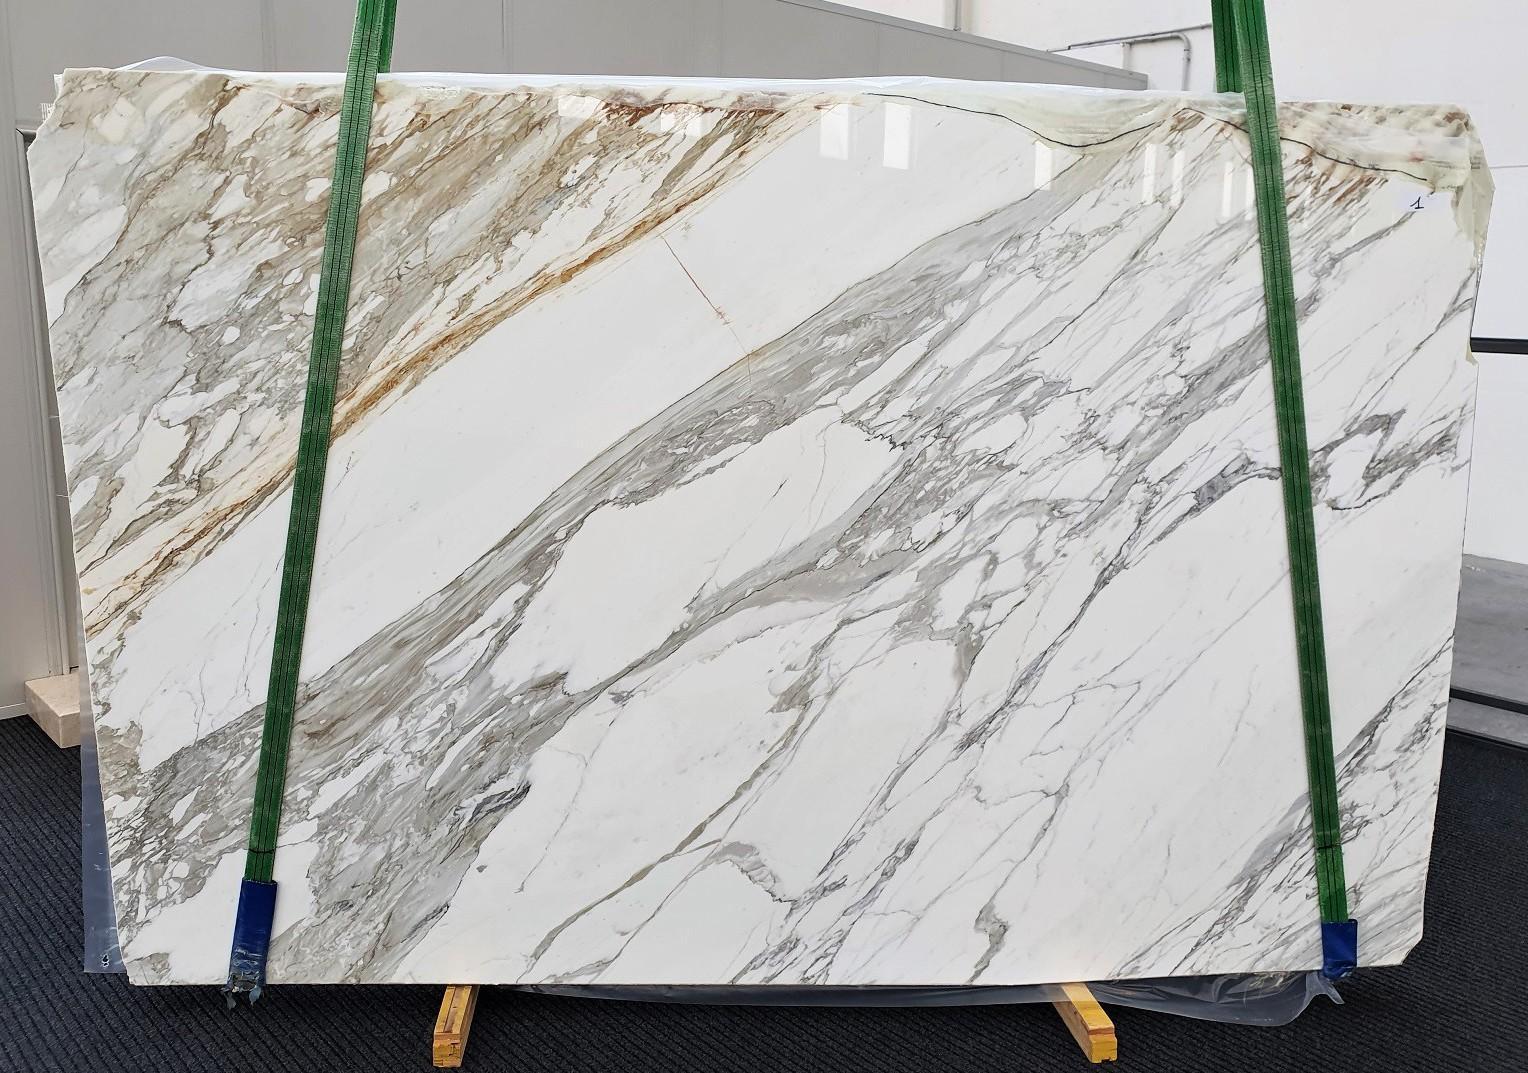 CALACATTA Supply Veneto (Italy) polished slabs 1344 , A - slab #01 natural marble